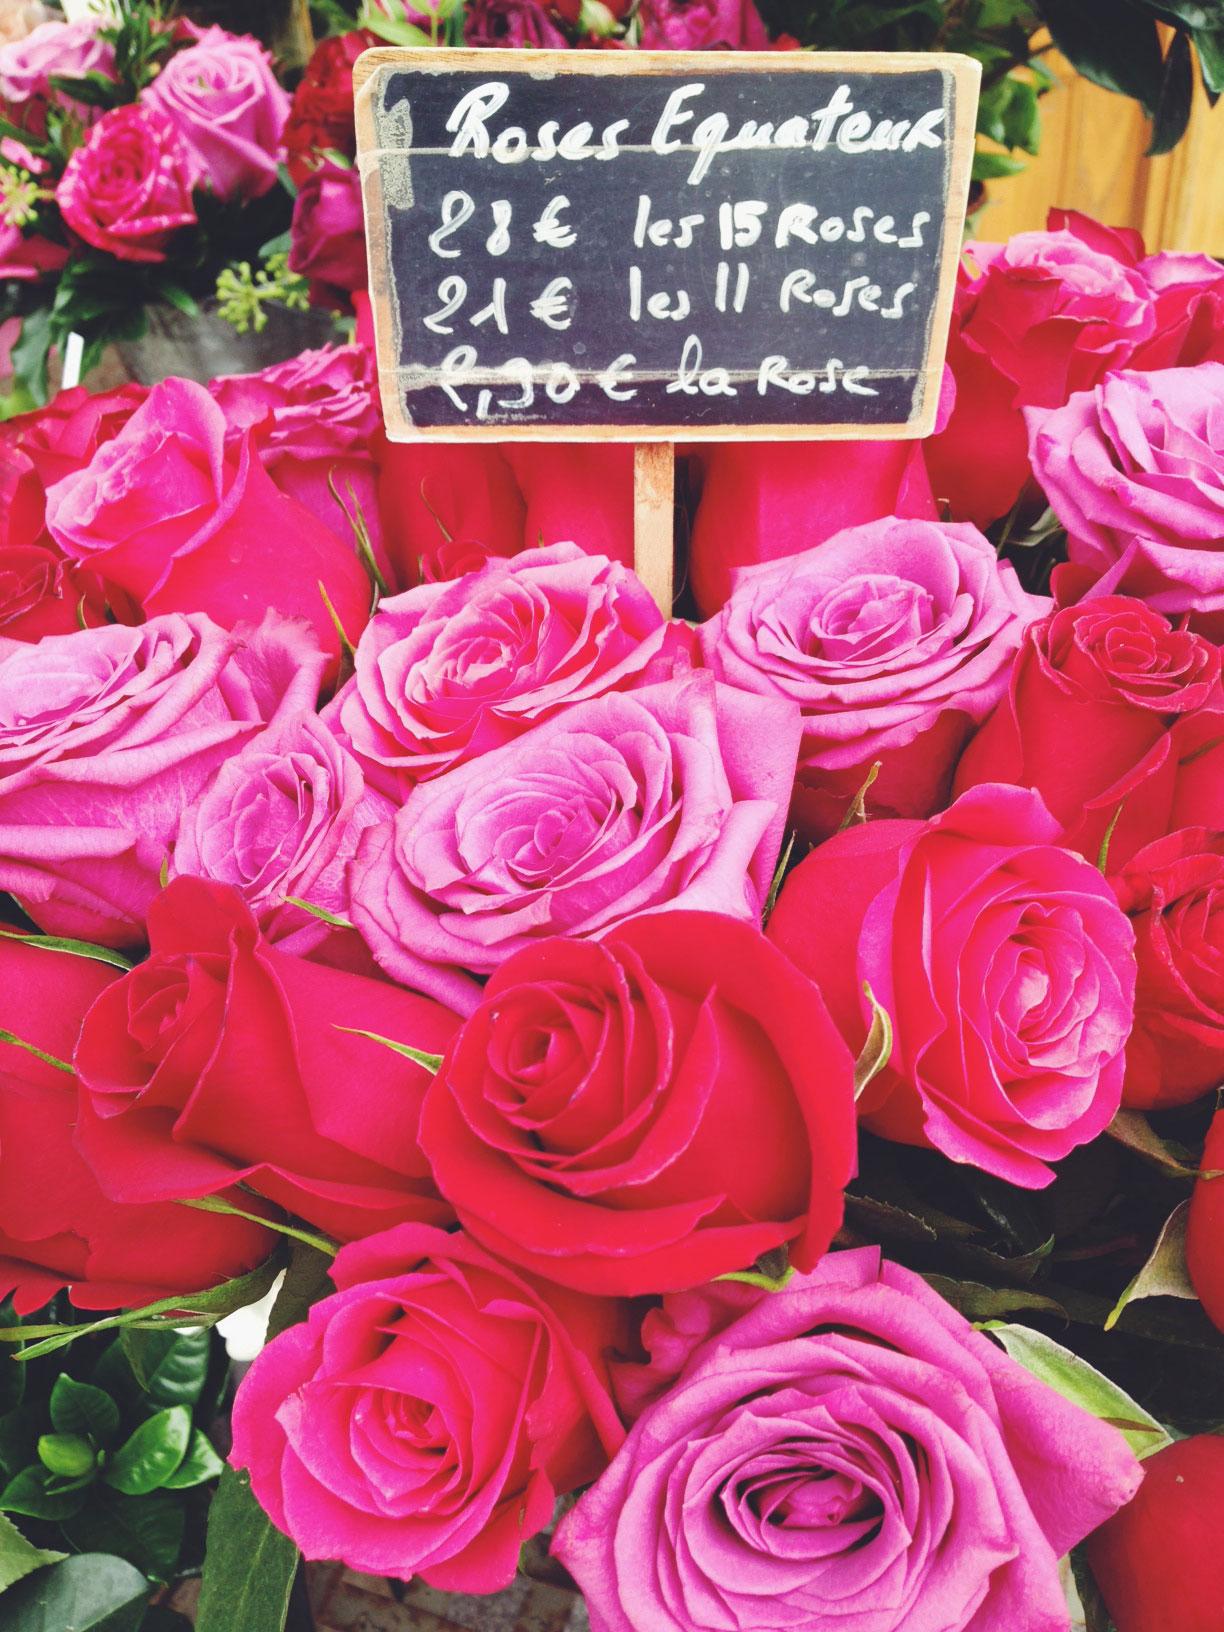 Roses-at-Paris-Market